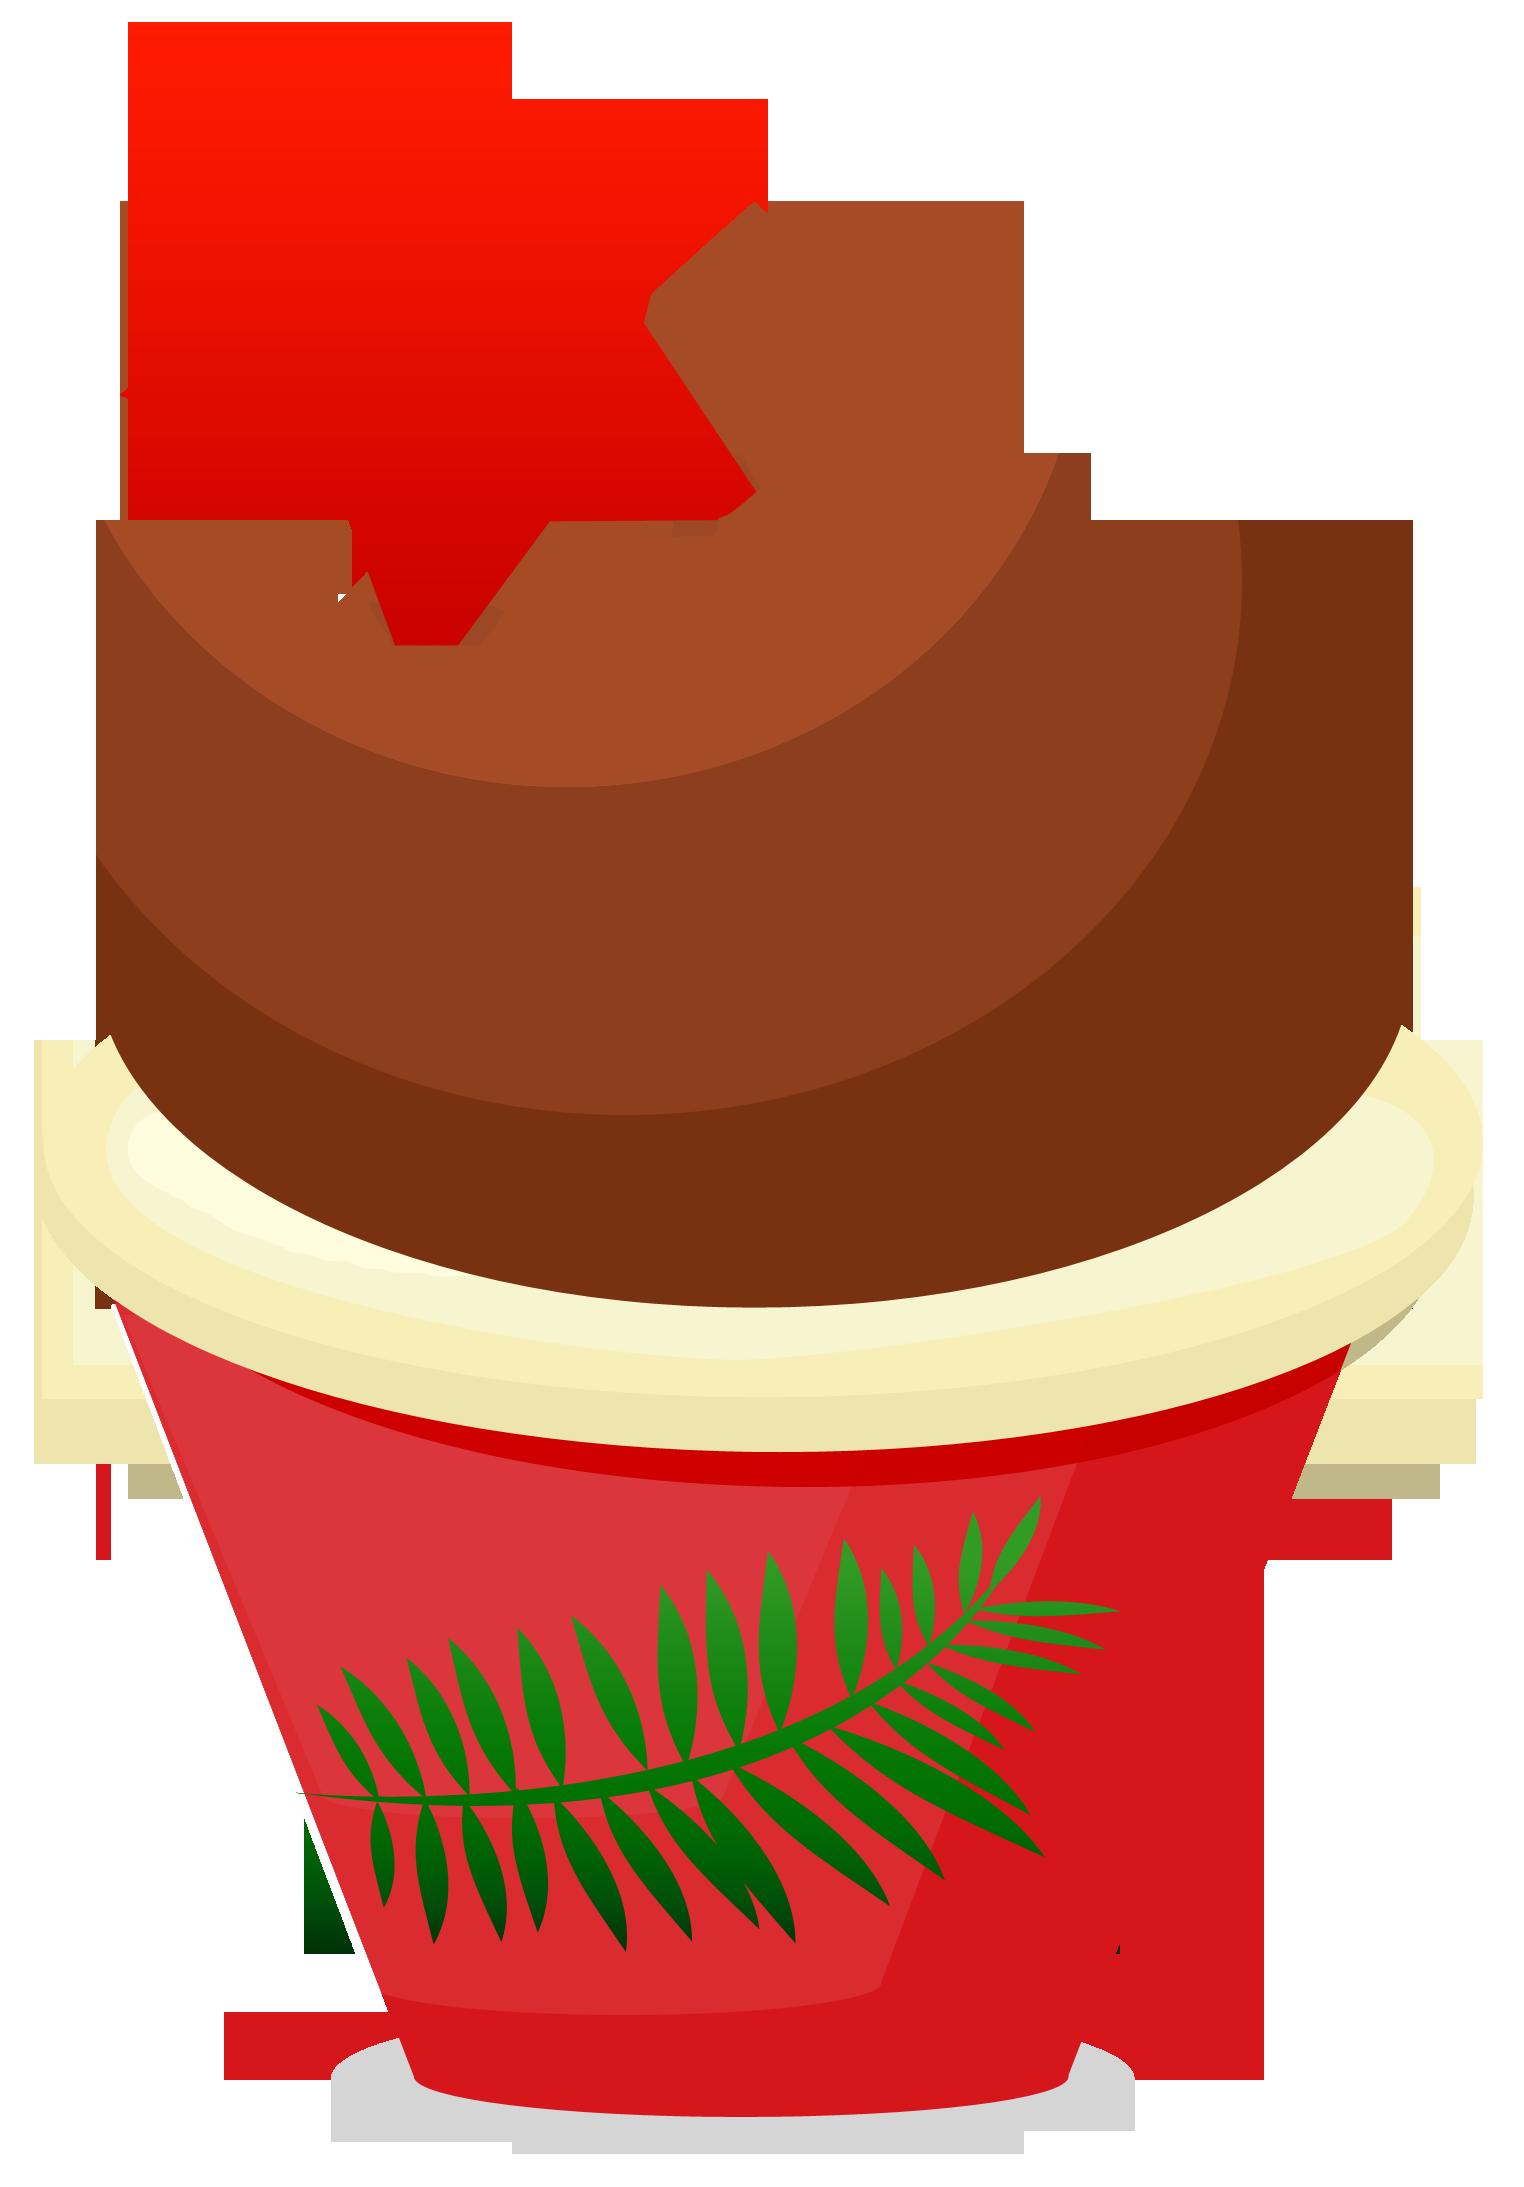 jpg transparent stock Brownie cupcake free on. Brownies clipart clip art